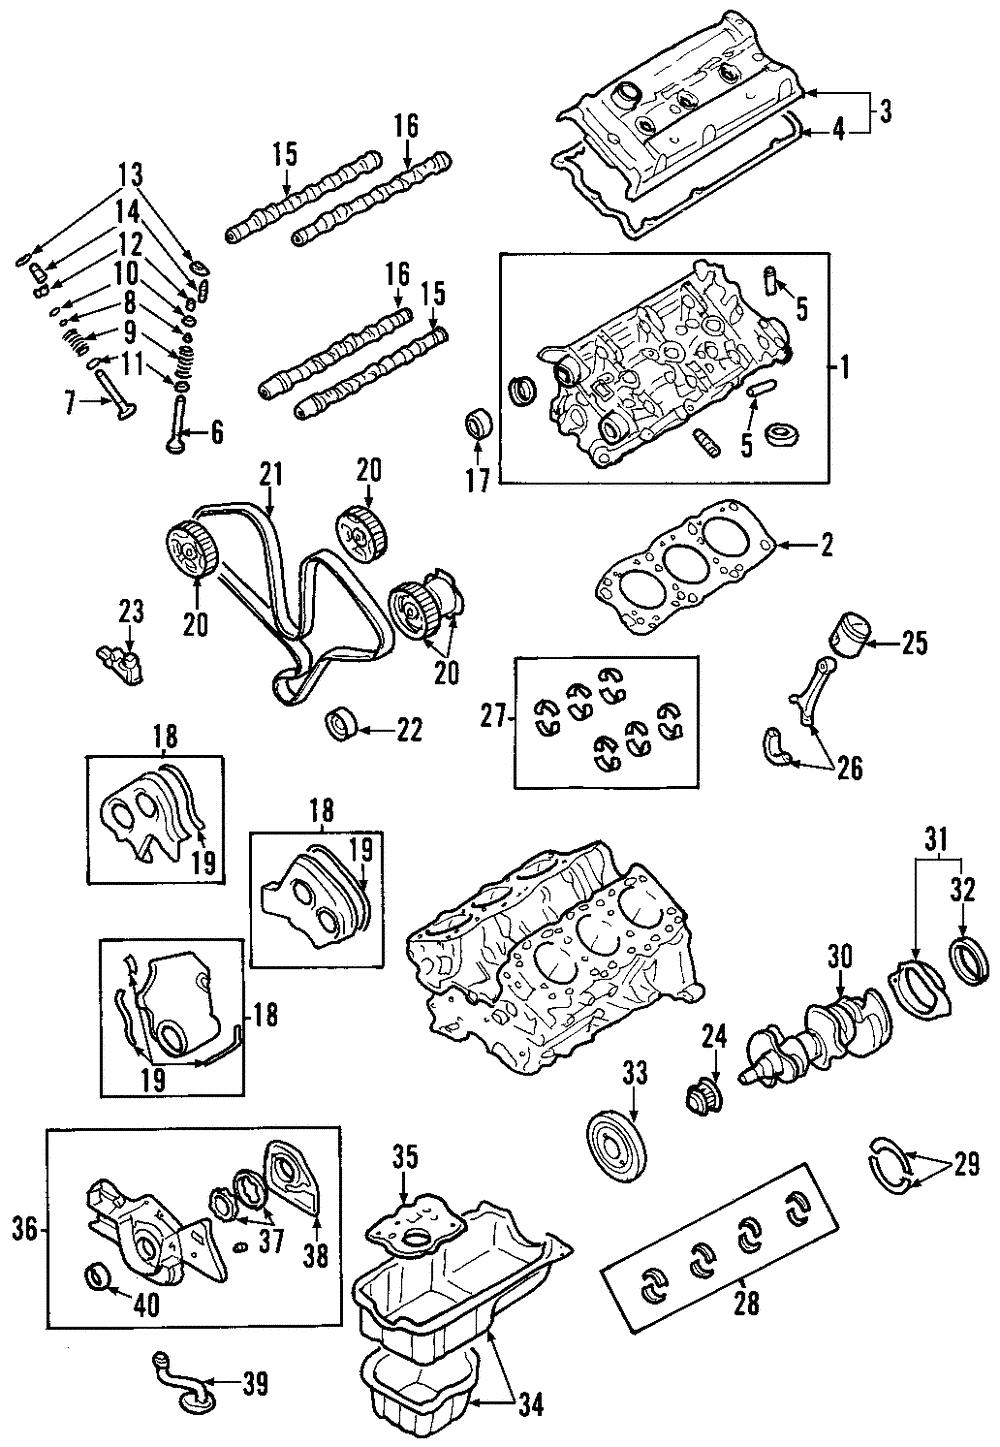 Engines & Engine Parts Engine Parts Kia 21360-39800 Engine ... on bmw z3 engine timing diagram, kia sorento engine schematic, kia sorento timing chain diagram,